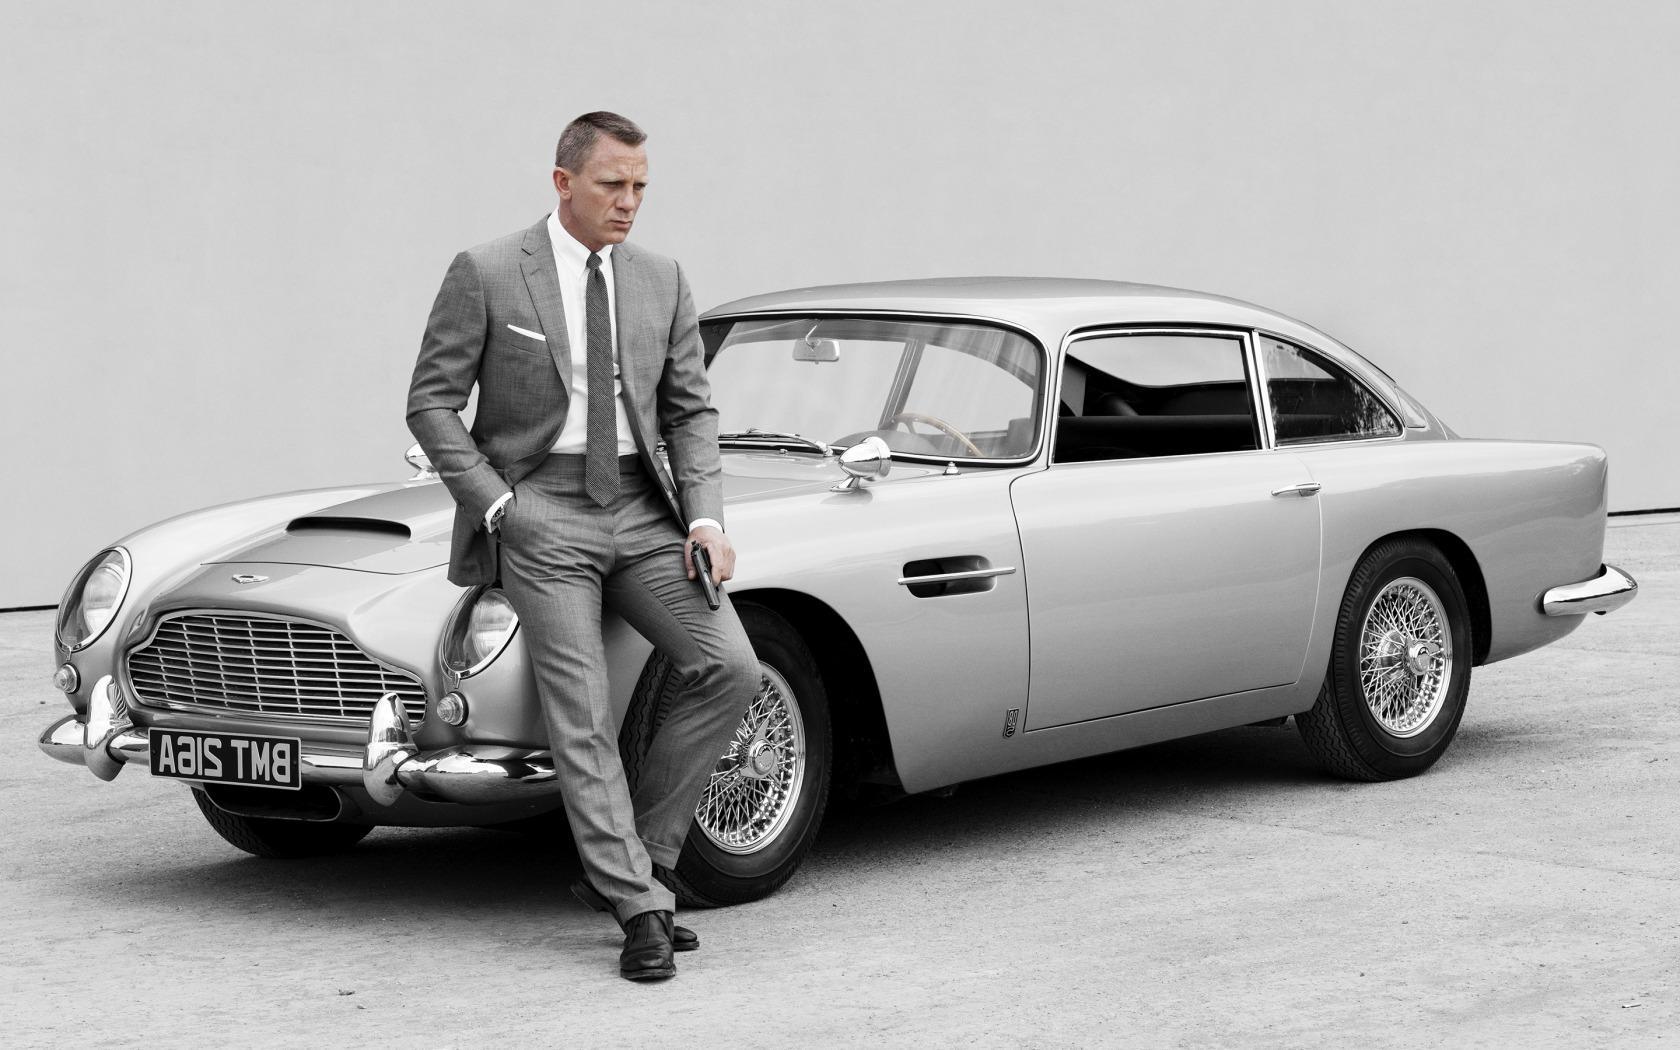 Worcester Misses Out On 750 Jobs As James Bond Car Maker Goes Elsewhere